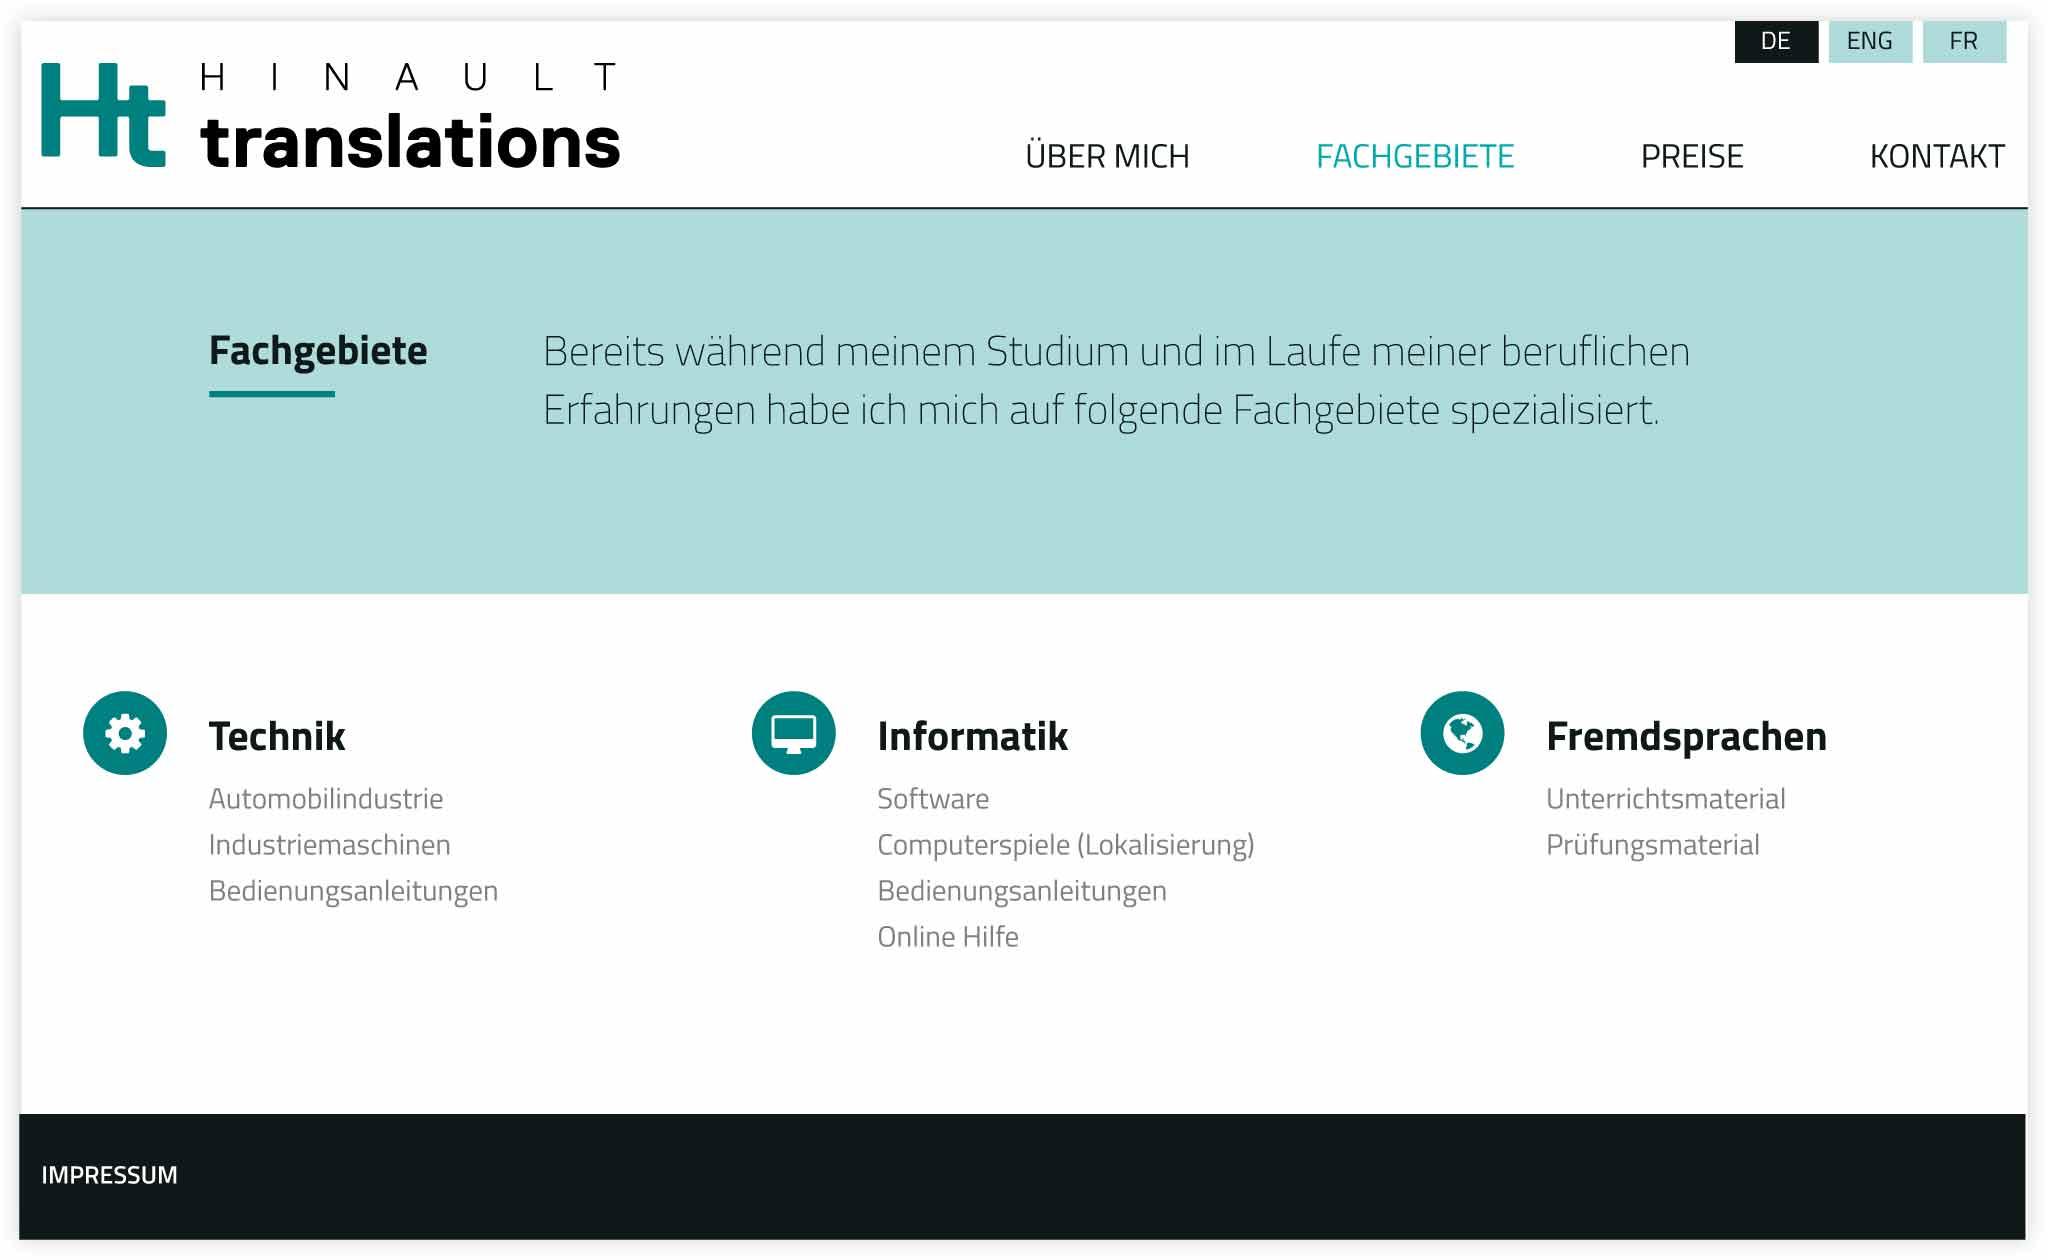 HINAULT translations Webdesign GesaSiebert Kommunikationsdesign Unterseite Fachgebiete